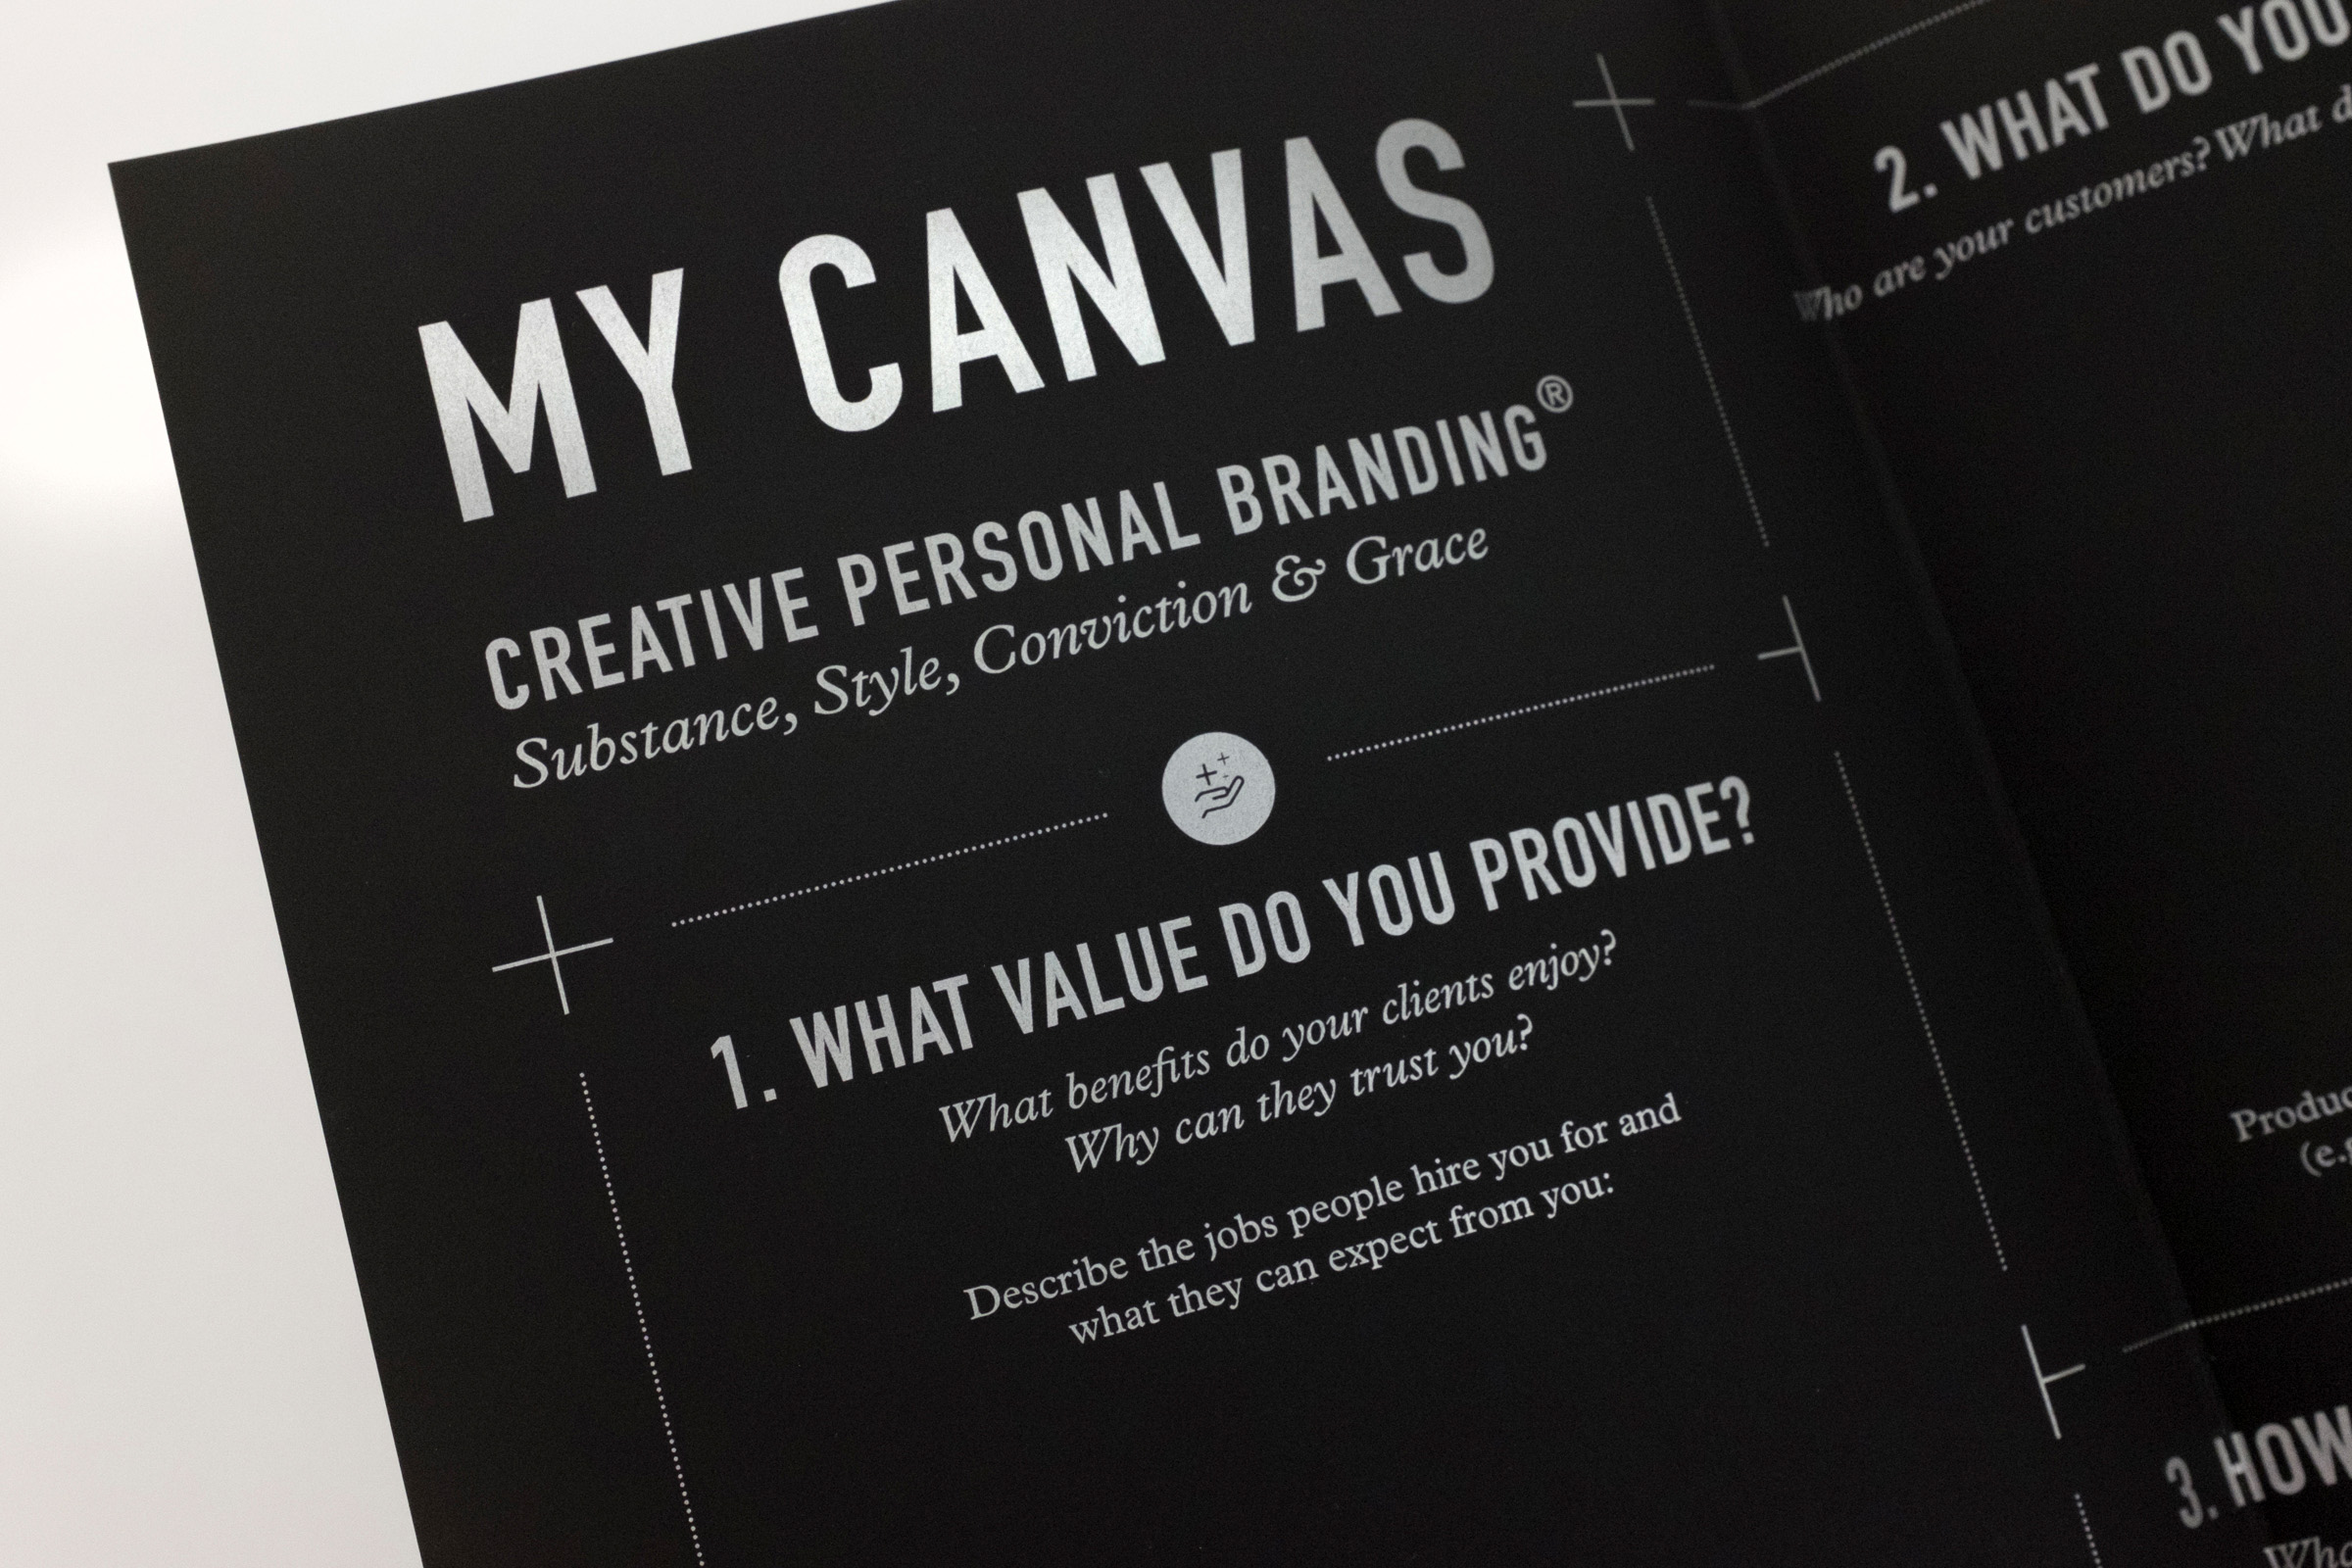 Creative_Personal_Branding_Canvas_5.jpg